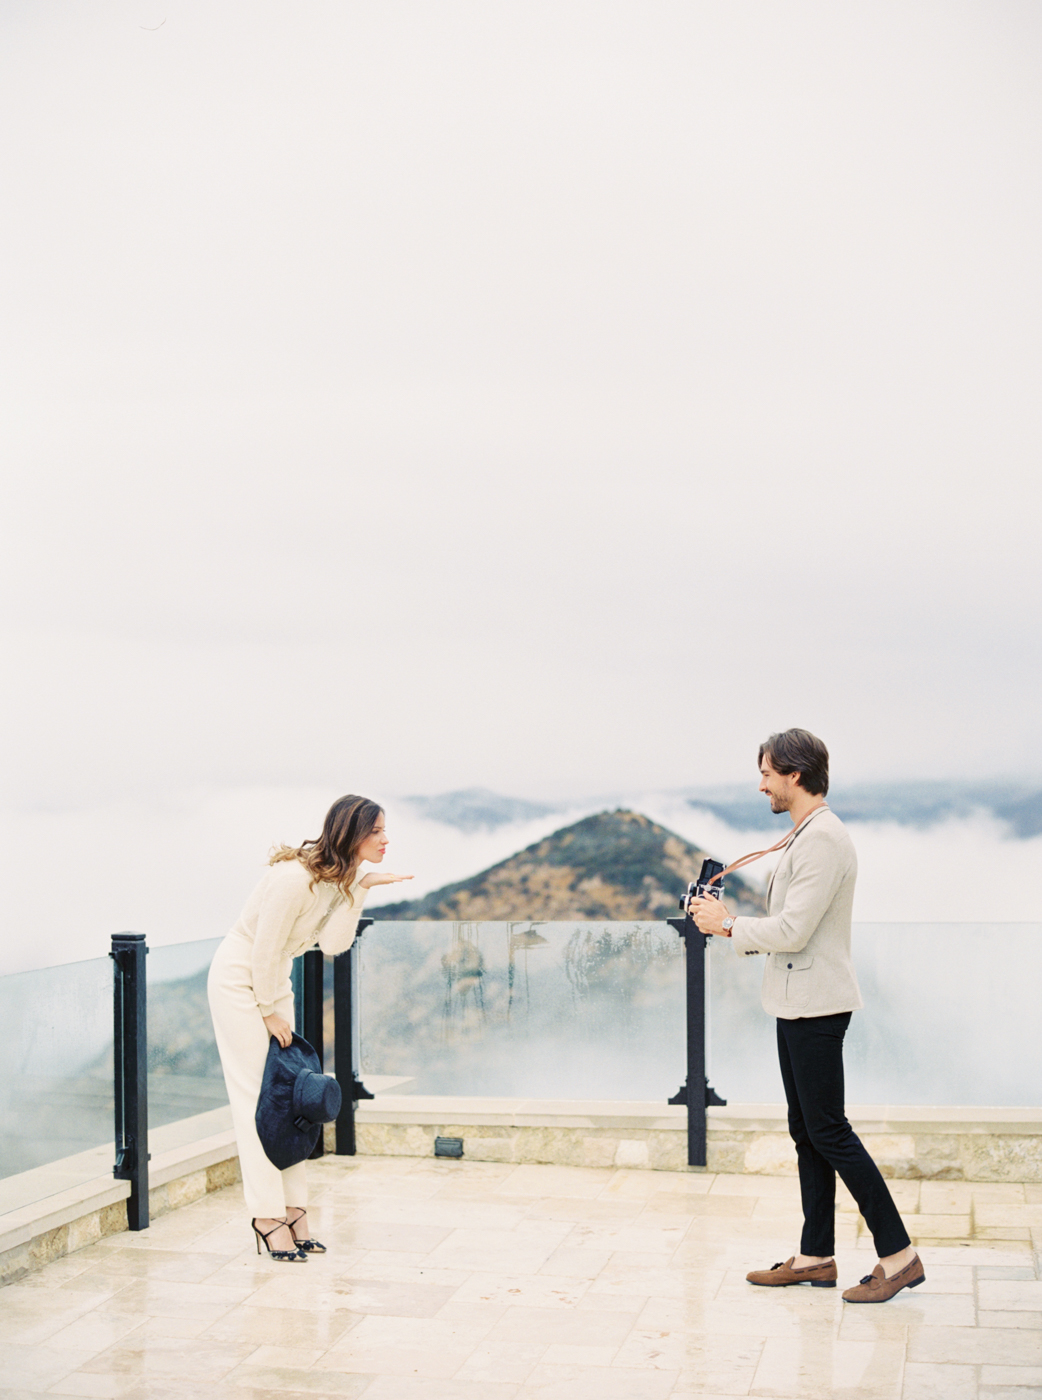 Rocky Oaks Engagement | Matthew Nigel Photography | Donny Zavala Photography Workshop | Joy Proctor | Engagement Session Inspiration | Joy Wed | Fine Art Engagement Session | Stacey Foley Design